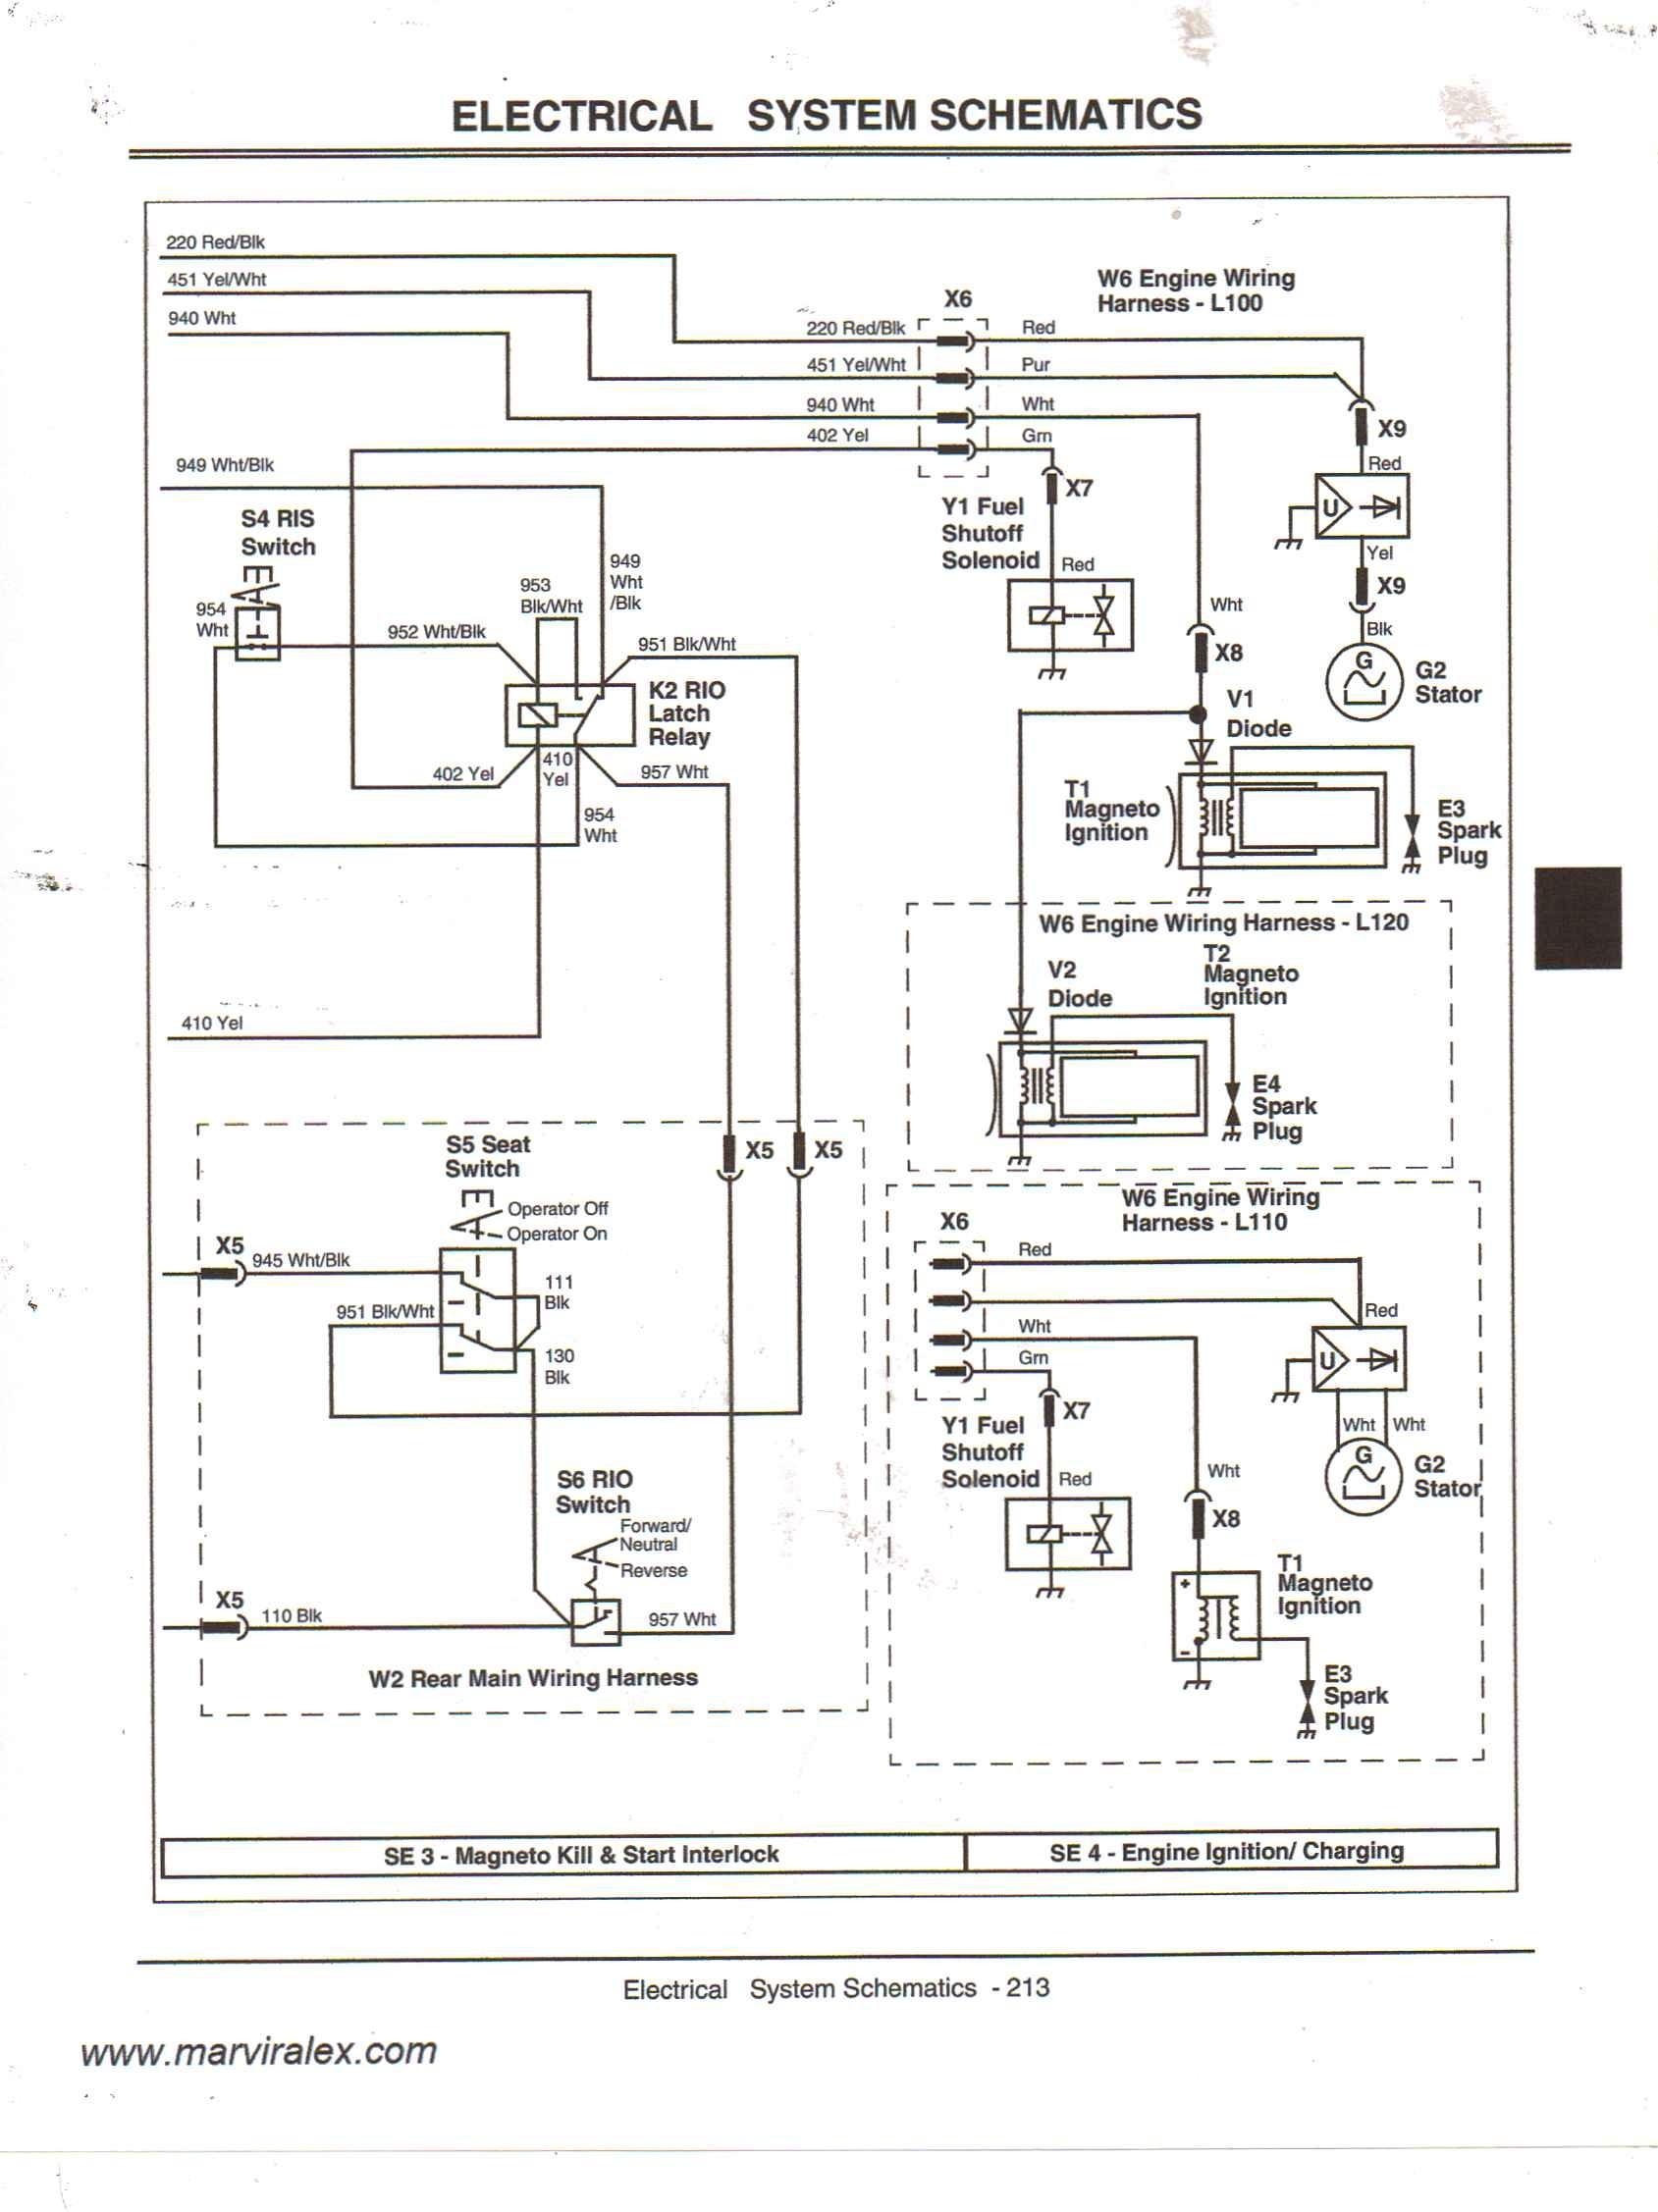 John Deere 345 Lawn Tractor Wiring Diagram Diagram] John Deere L111 Lawn Tractor Wiring Diagram Full Of John Deere 345 Lawn Tractor Wiring Diagram